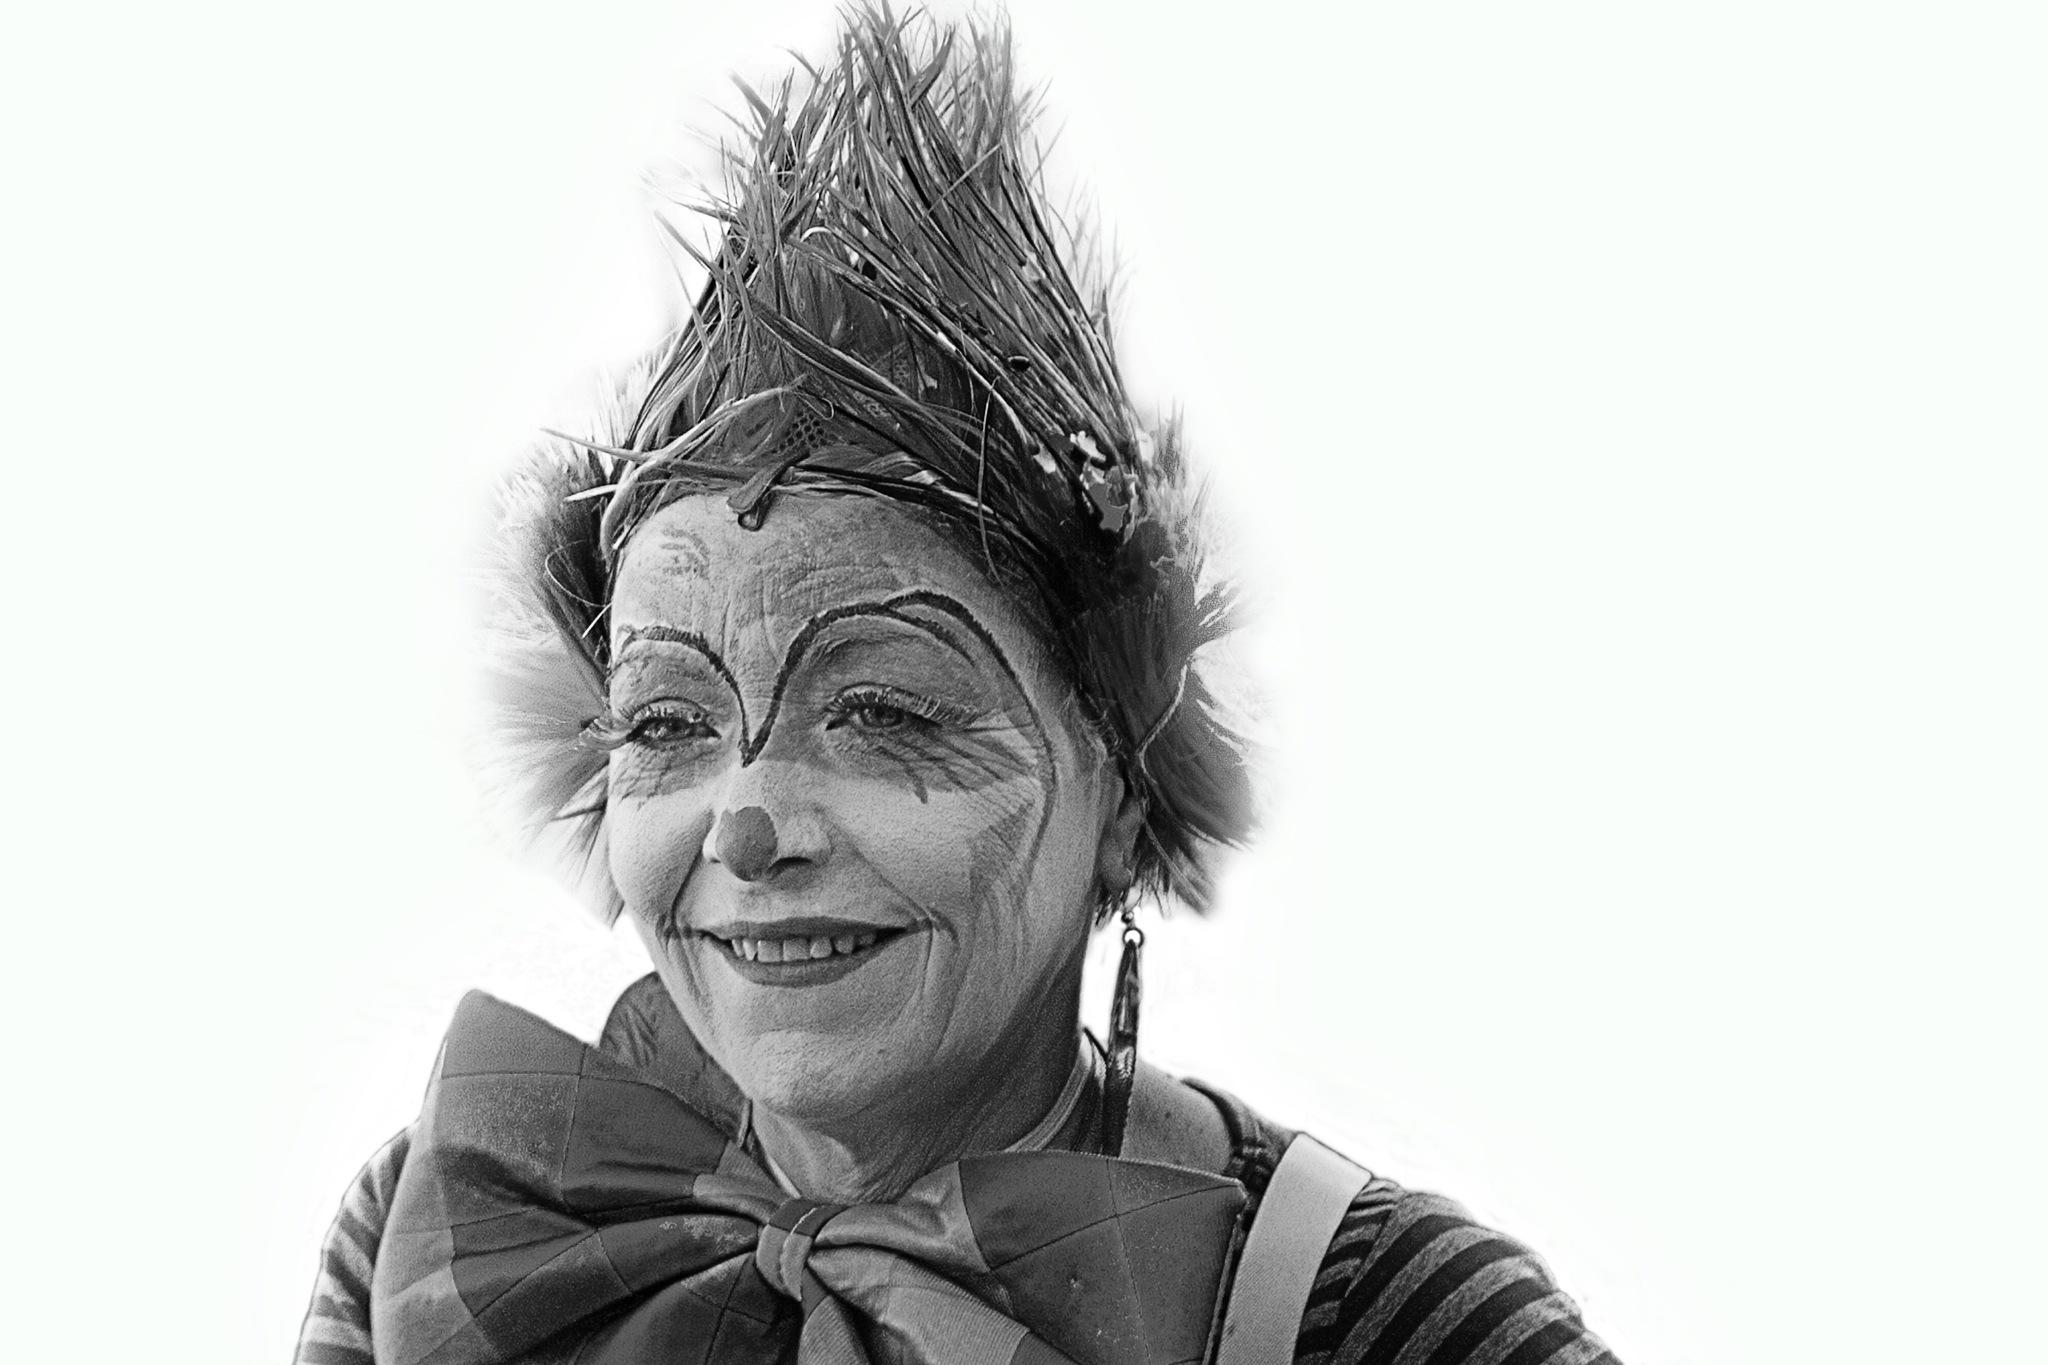 Le clown. by jef Polizzi